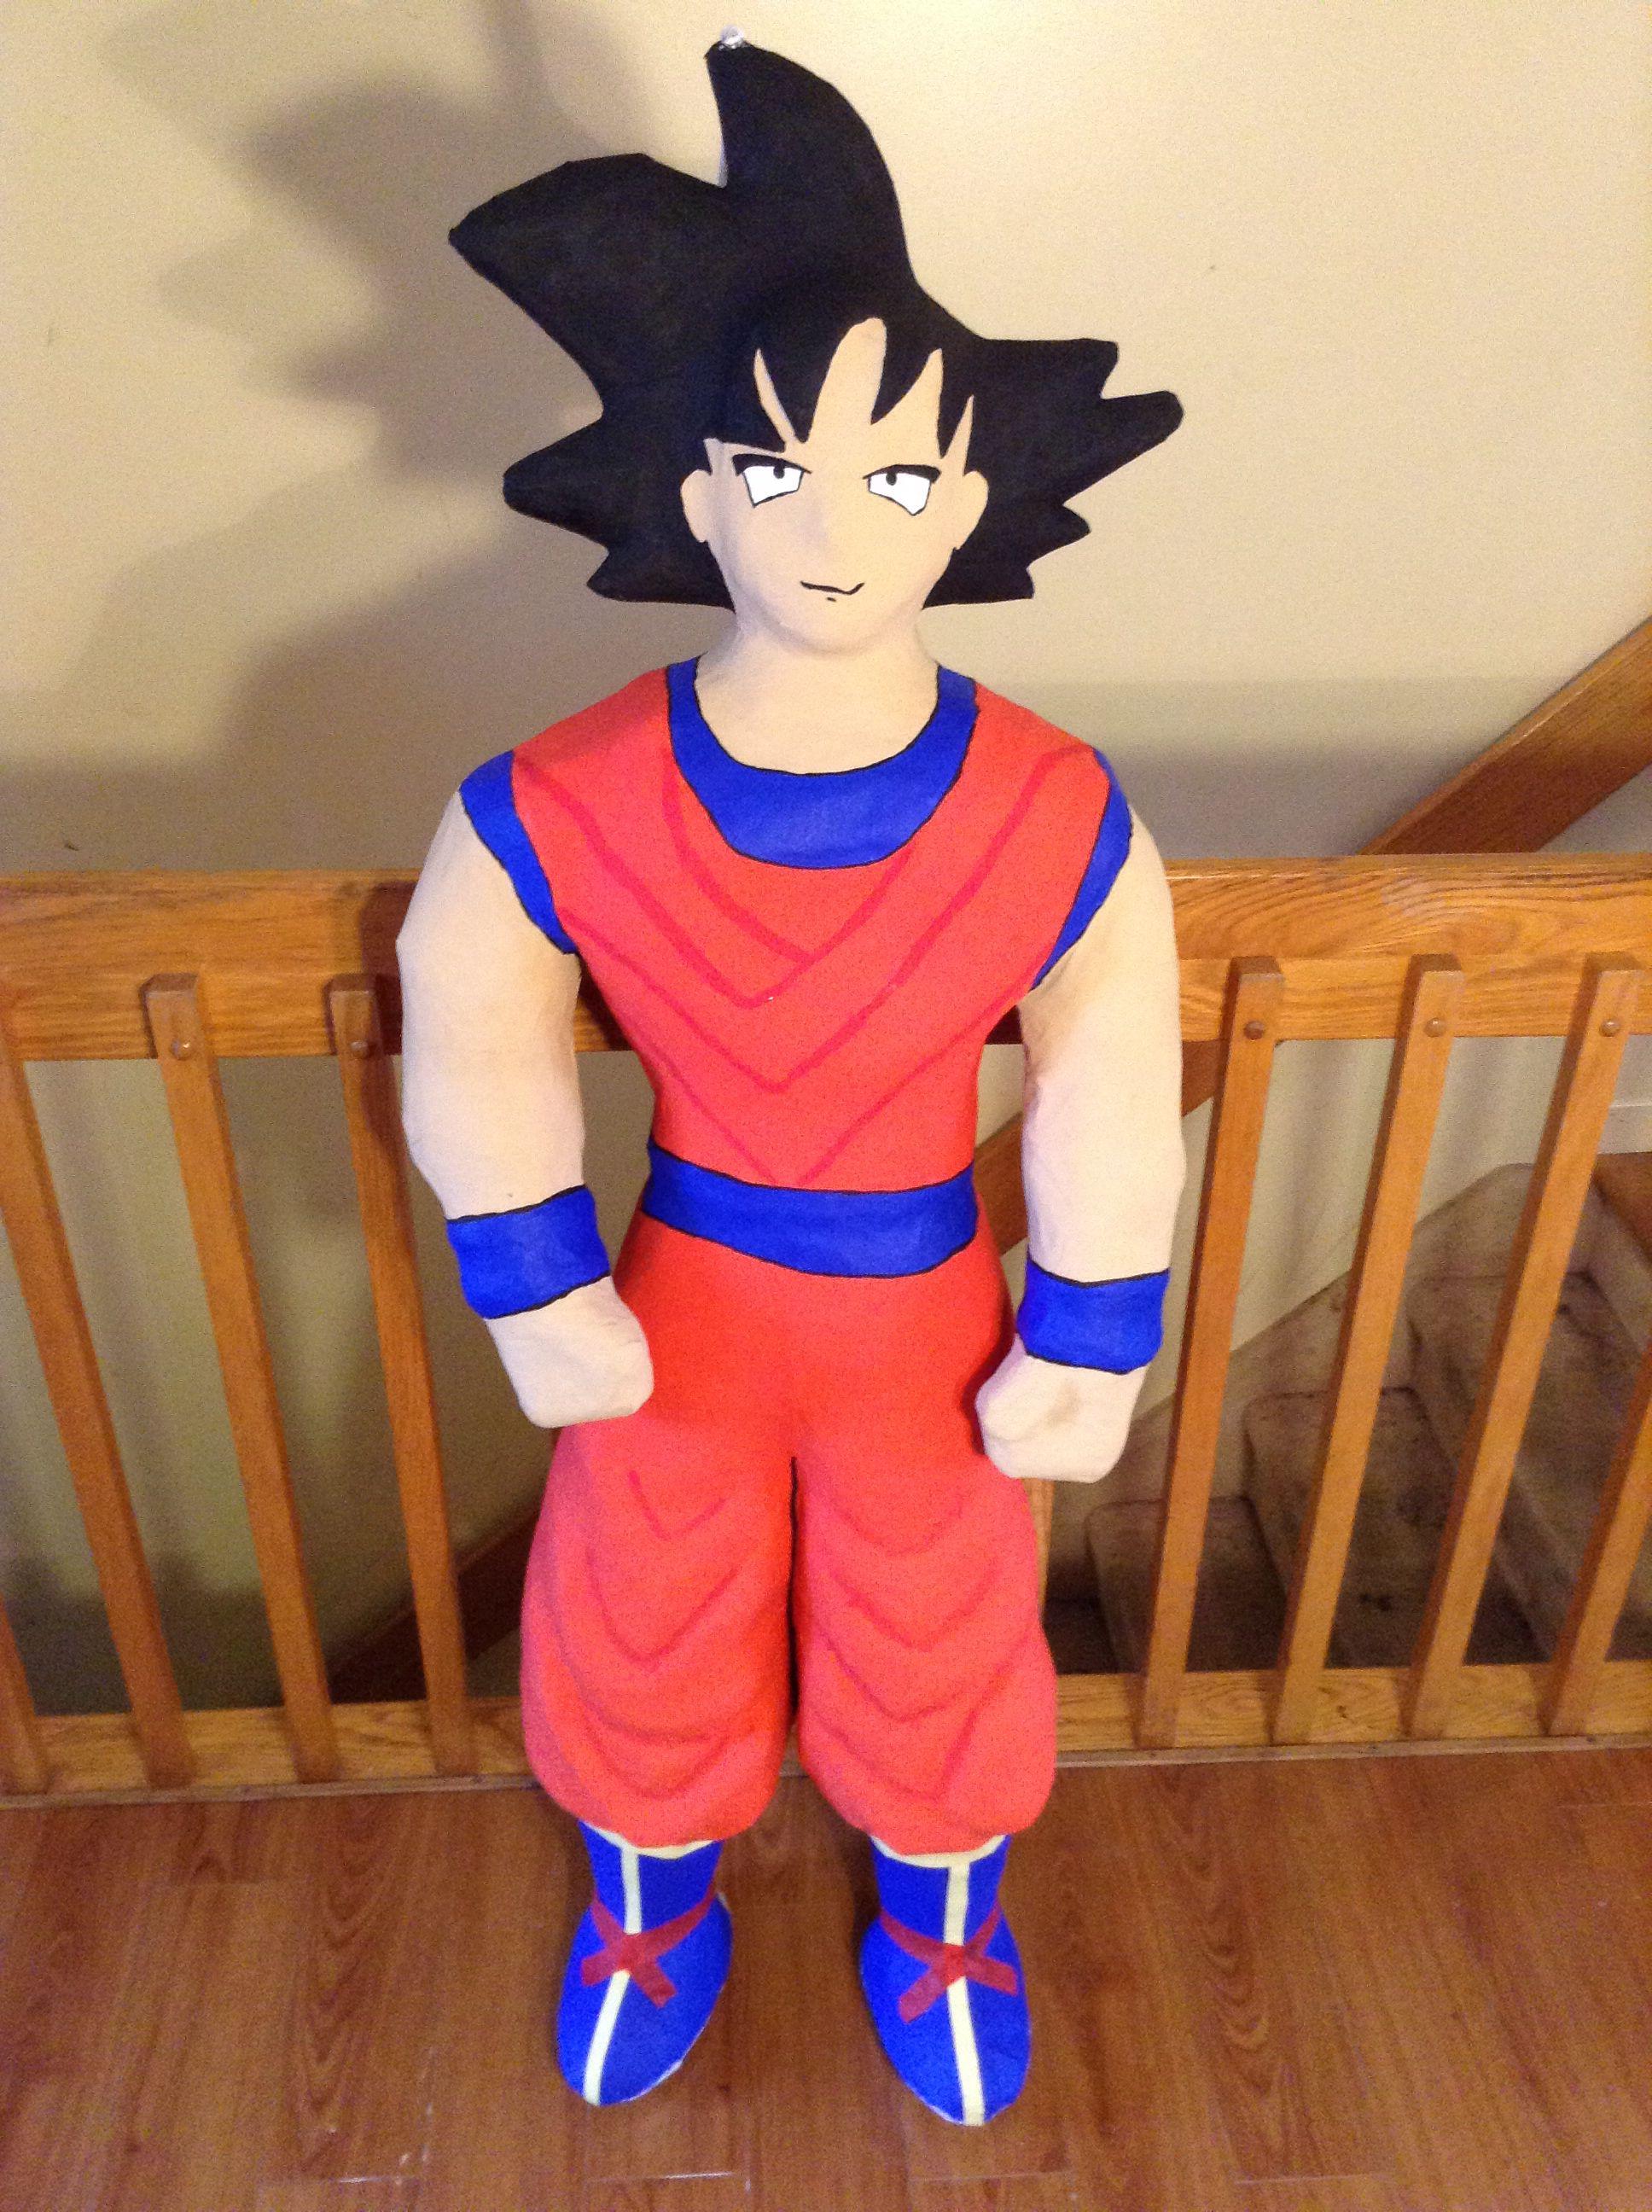 Goku Pinata Visit Now For 3d Dragon Ball Z Compression Shirts Now On Sale Dragonball Dbz Dragonballsupe